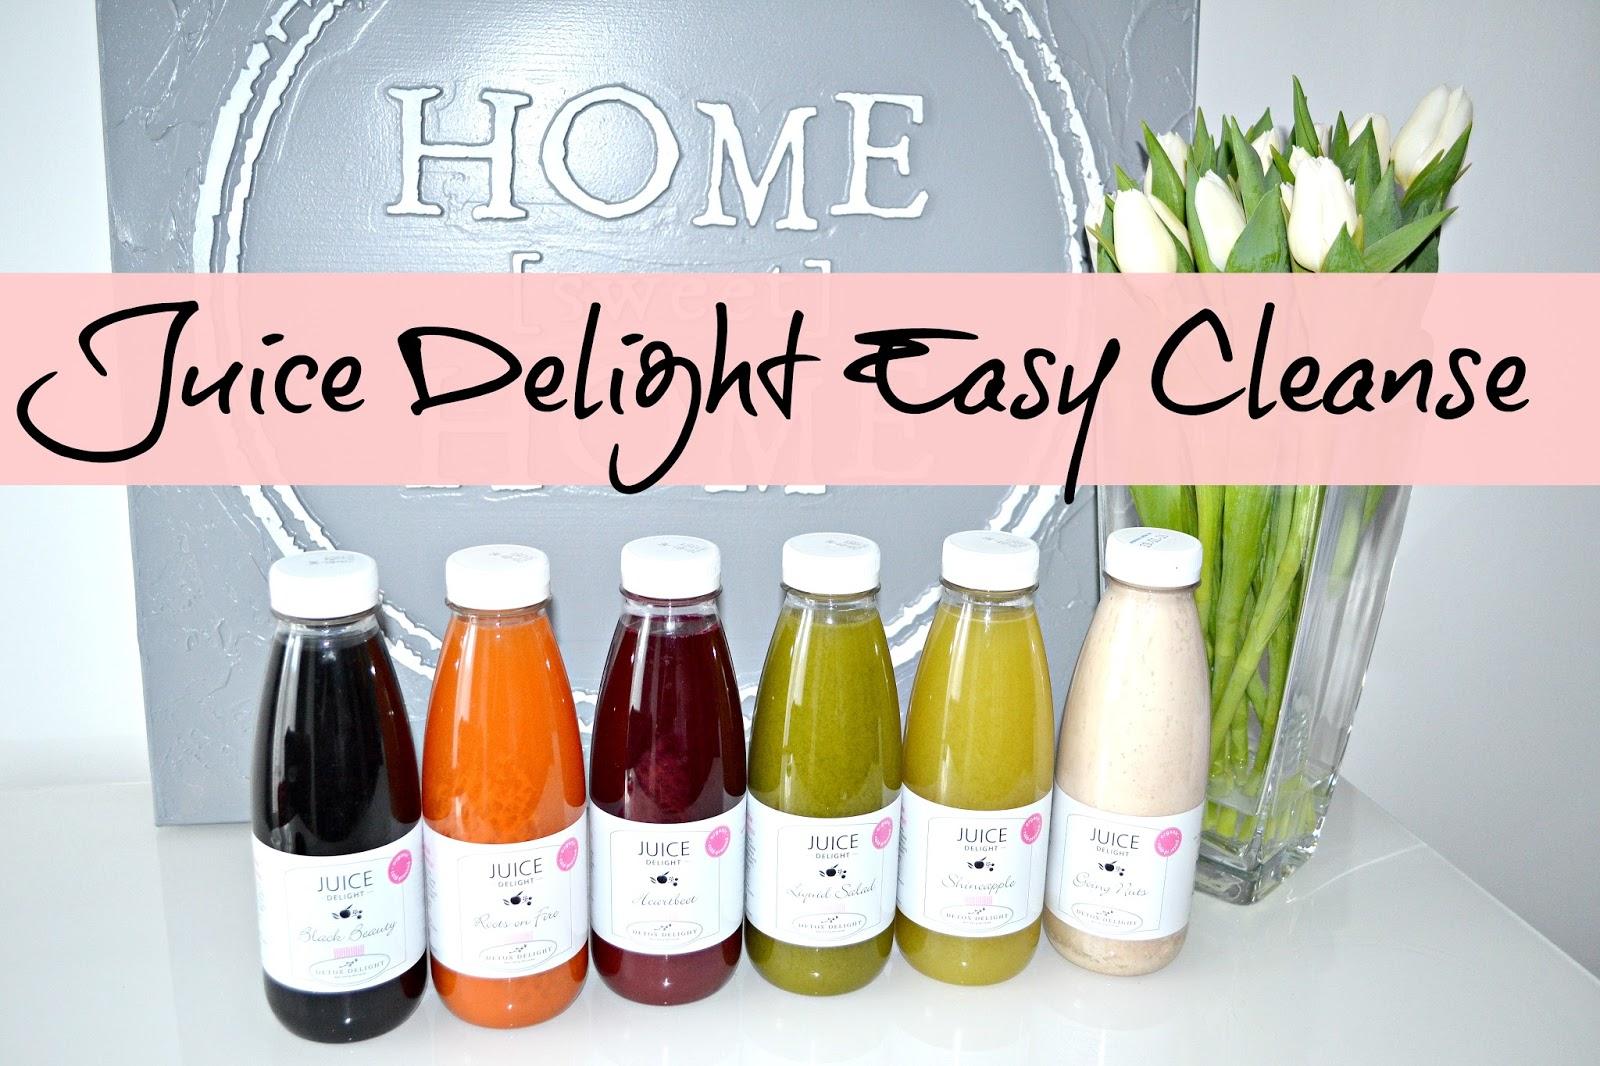 diorella s beauty blog beauty lifestyle blog aus sterreich review detox delight juice. Black Bedroom Furniture Sets. Home Design Ideas